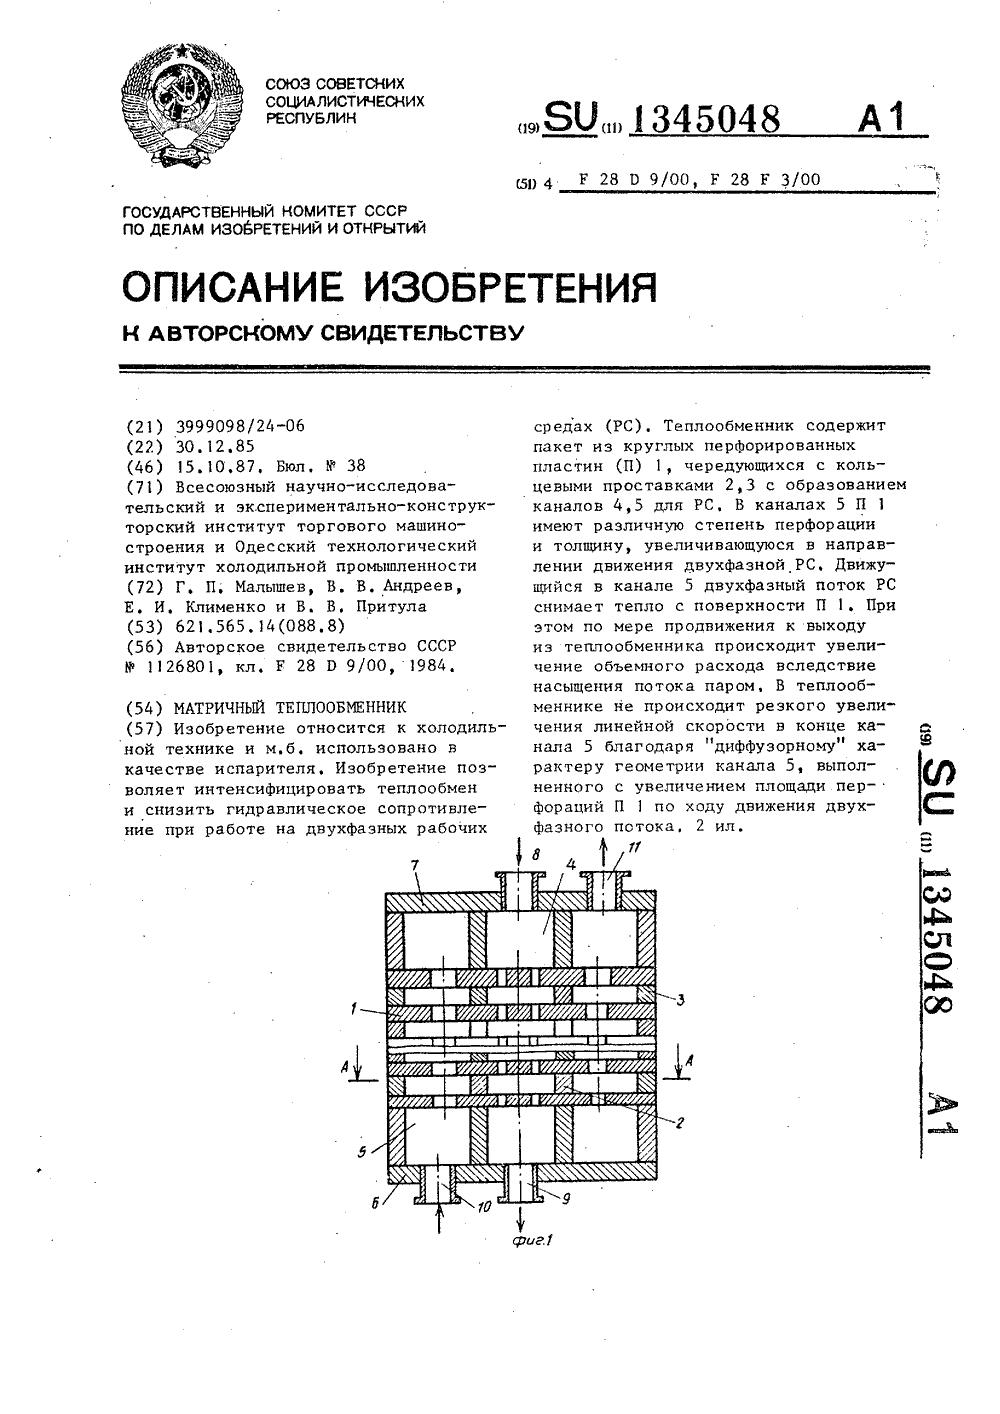 Теплообменник матричный Паяный теплообменник Funke GPLK 55 Биробиджан